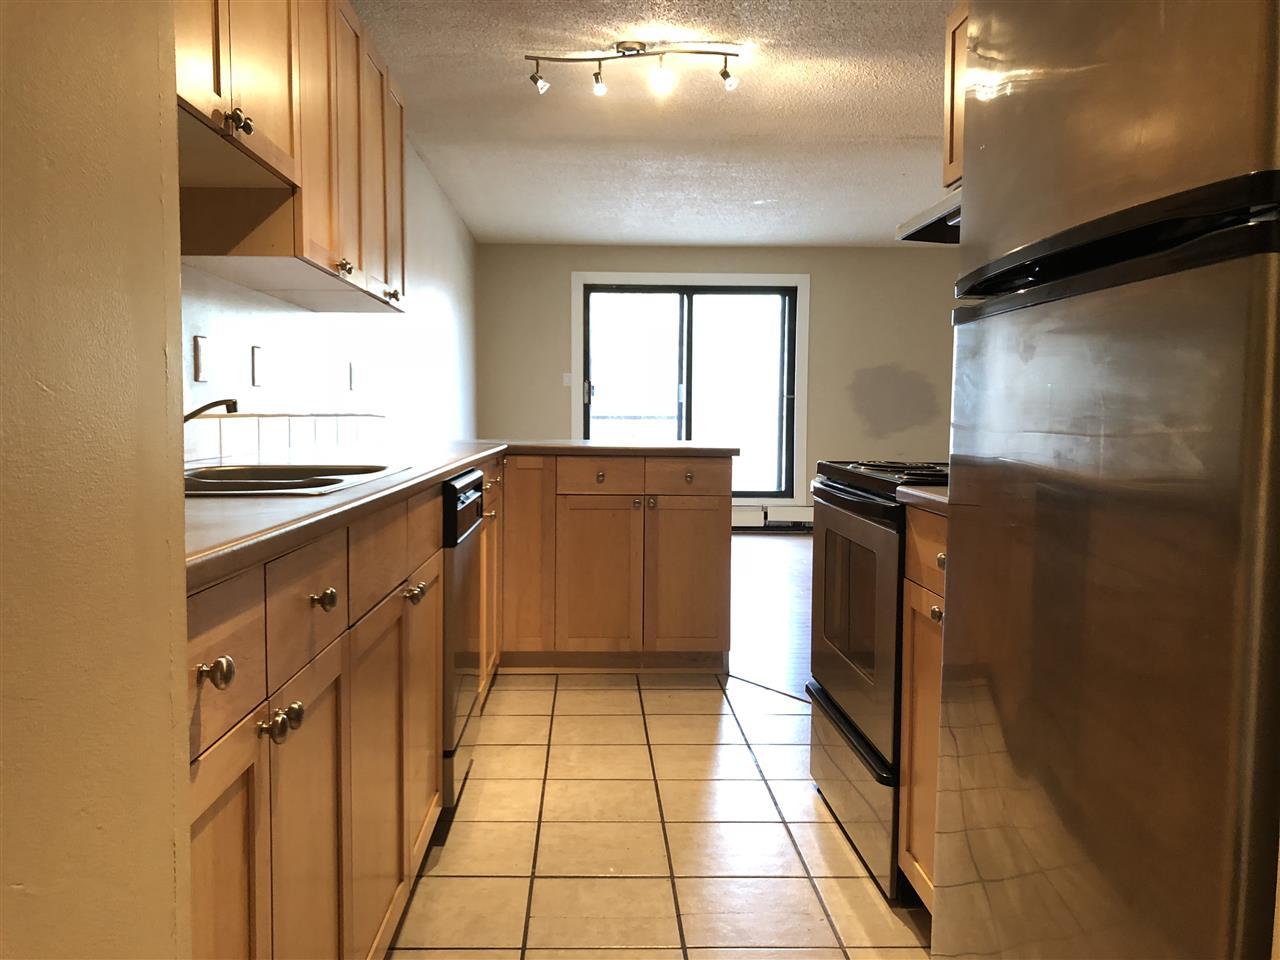 202 10917 109 Street, 2 bed, 1 bath, at $139,000